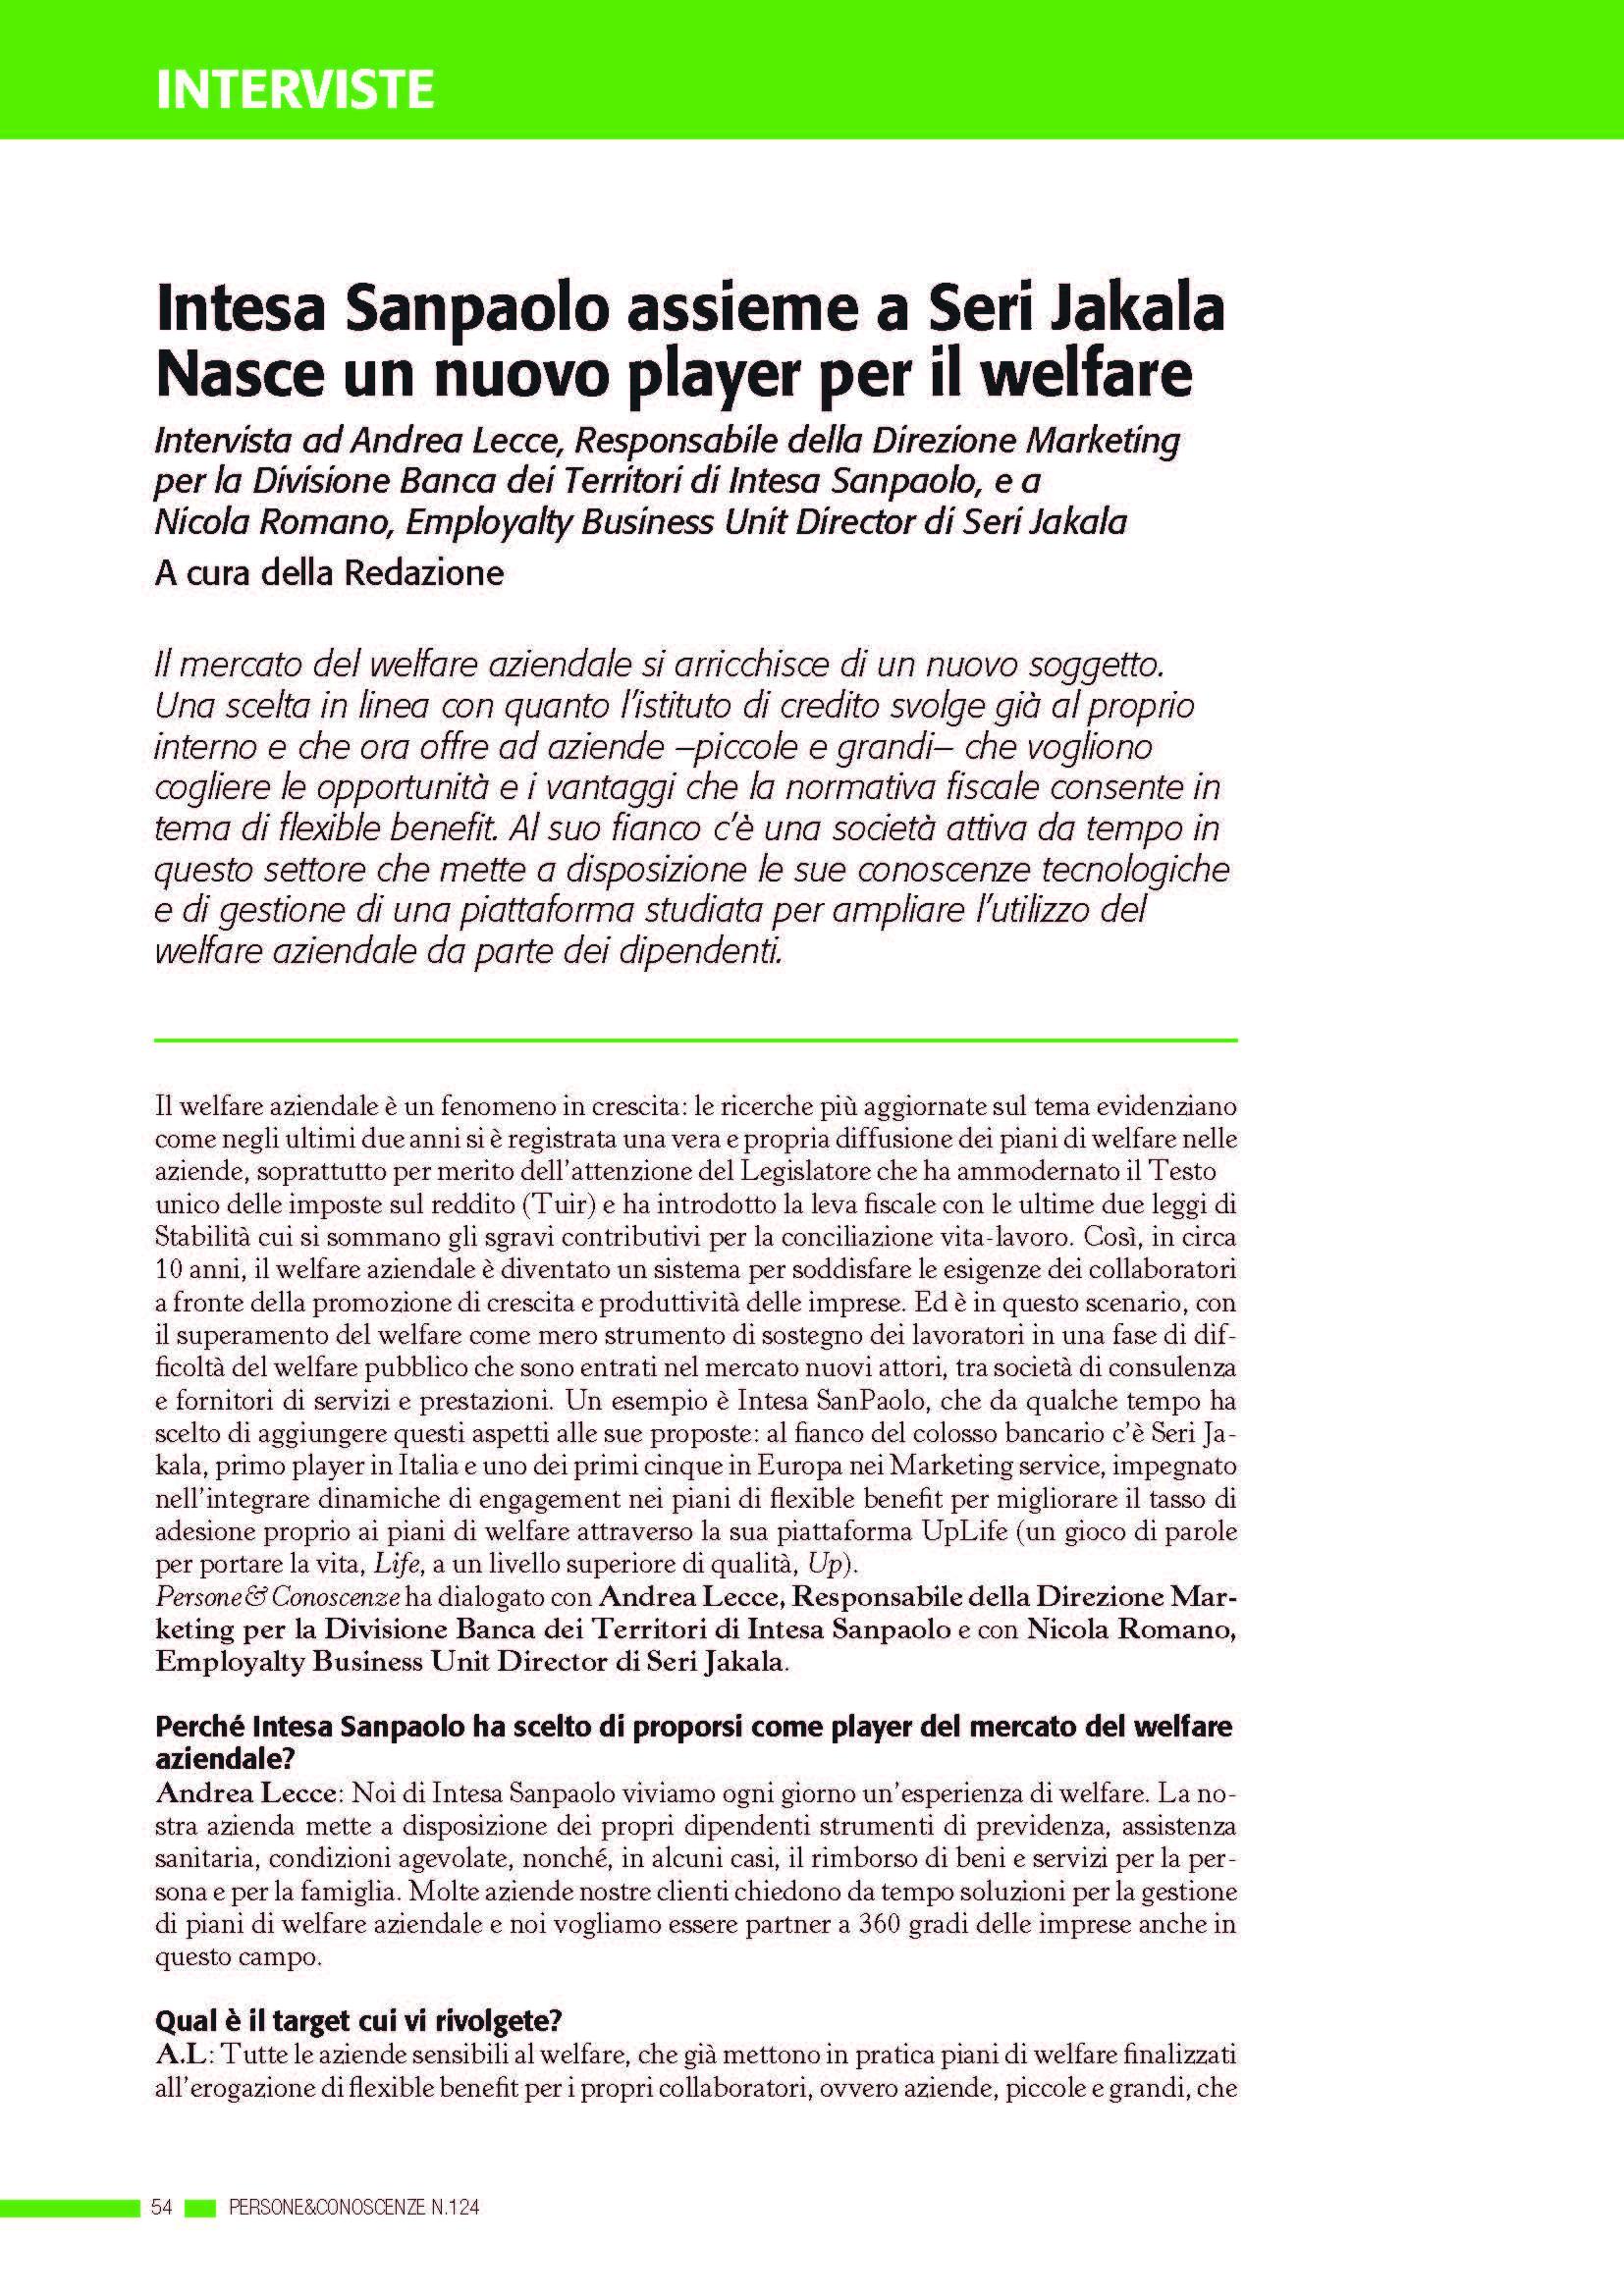 Intesa Sanpaolo assieme a Seri Jakala nasce un nuovo player per il welfare